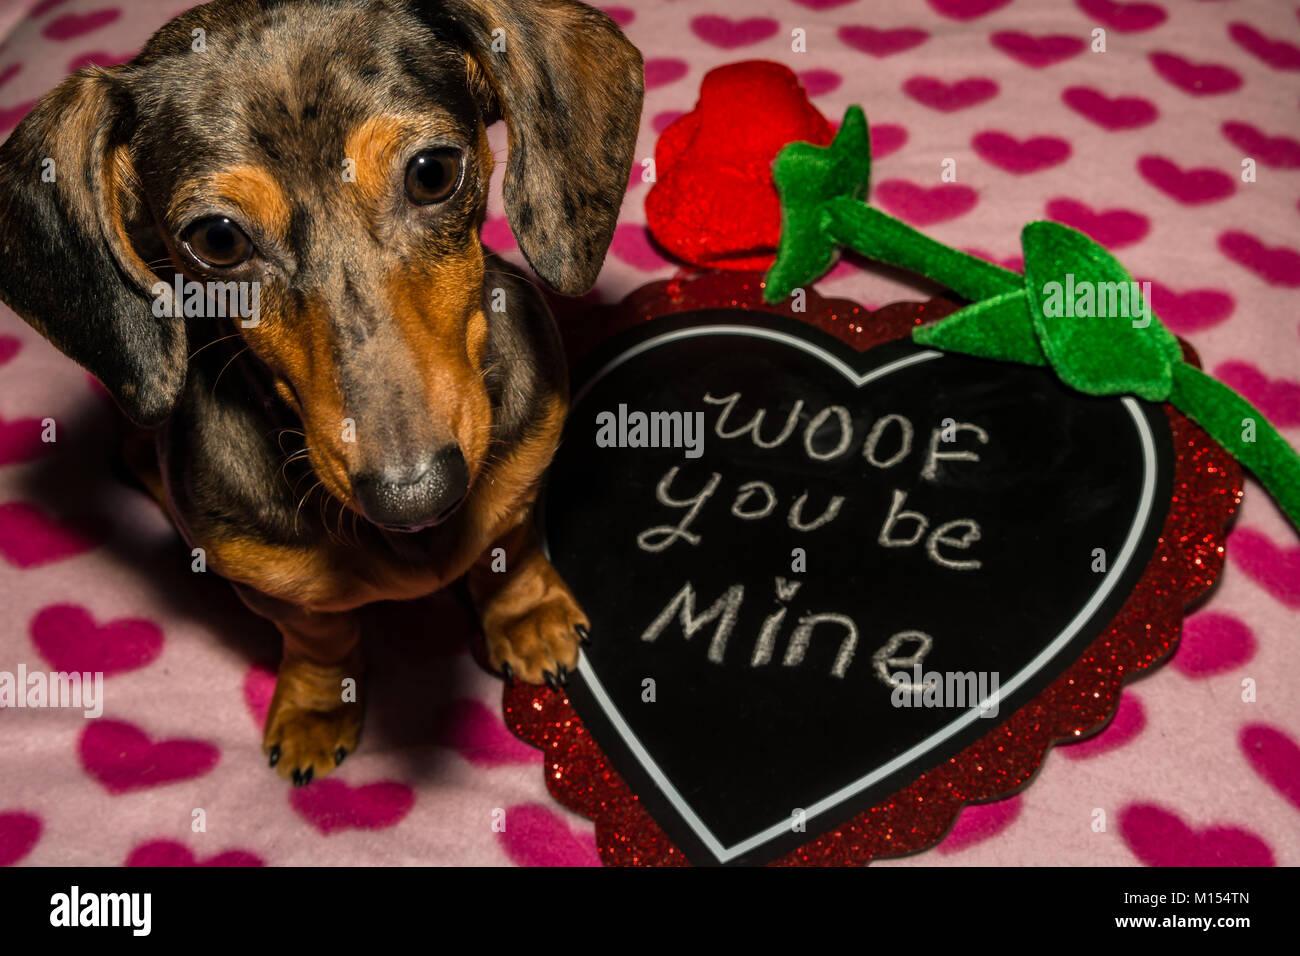 Pup Puppy Dog Flower Stock Photos Amp Pup Puppy Dog Flower